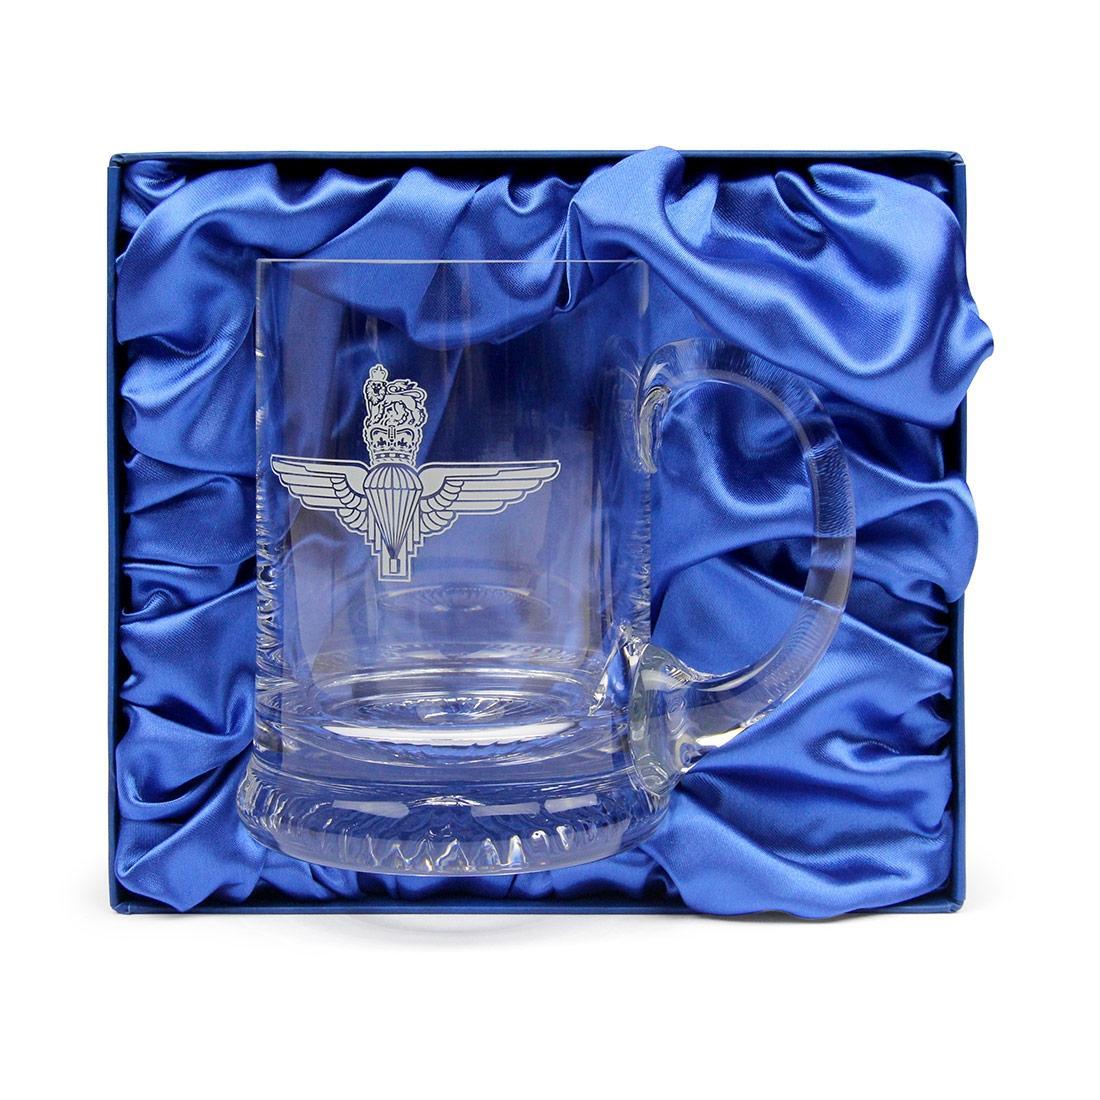 Crystal Beer Mug, Engraved - Parachute Regiment